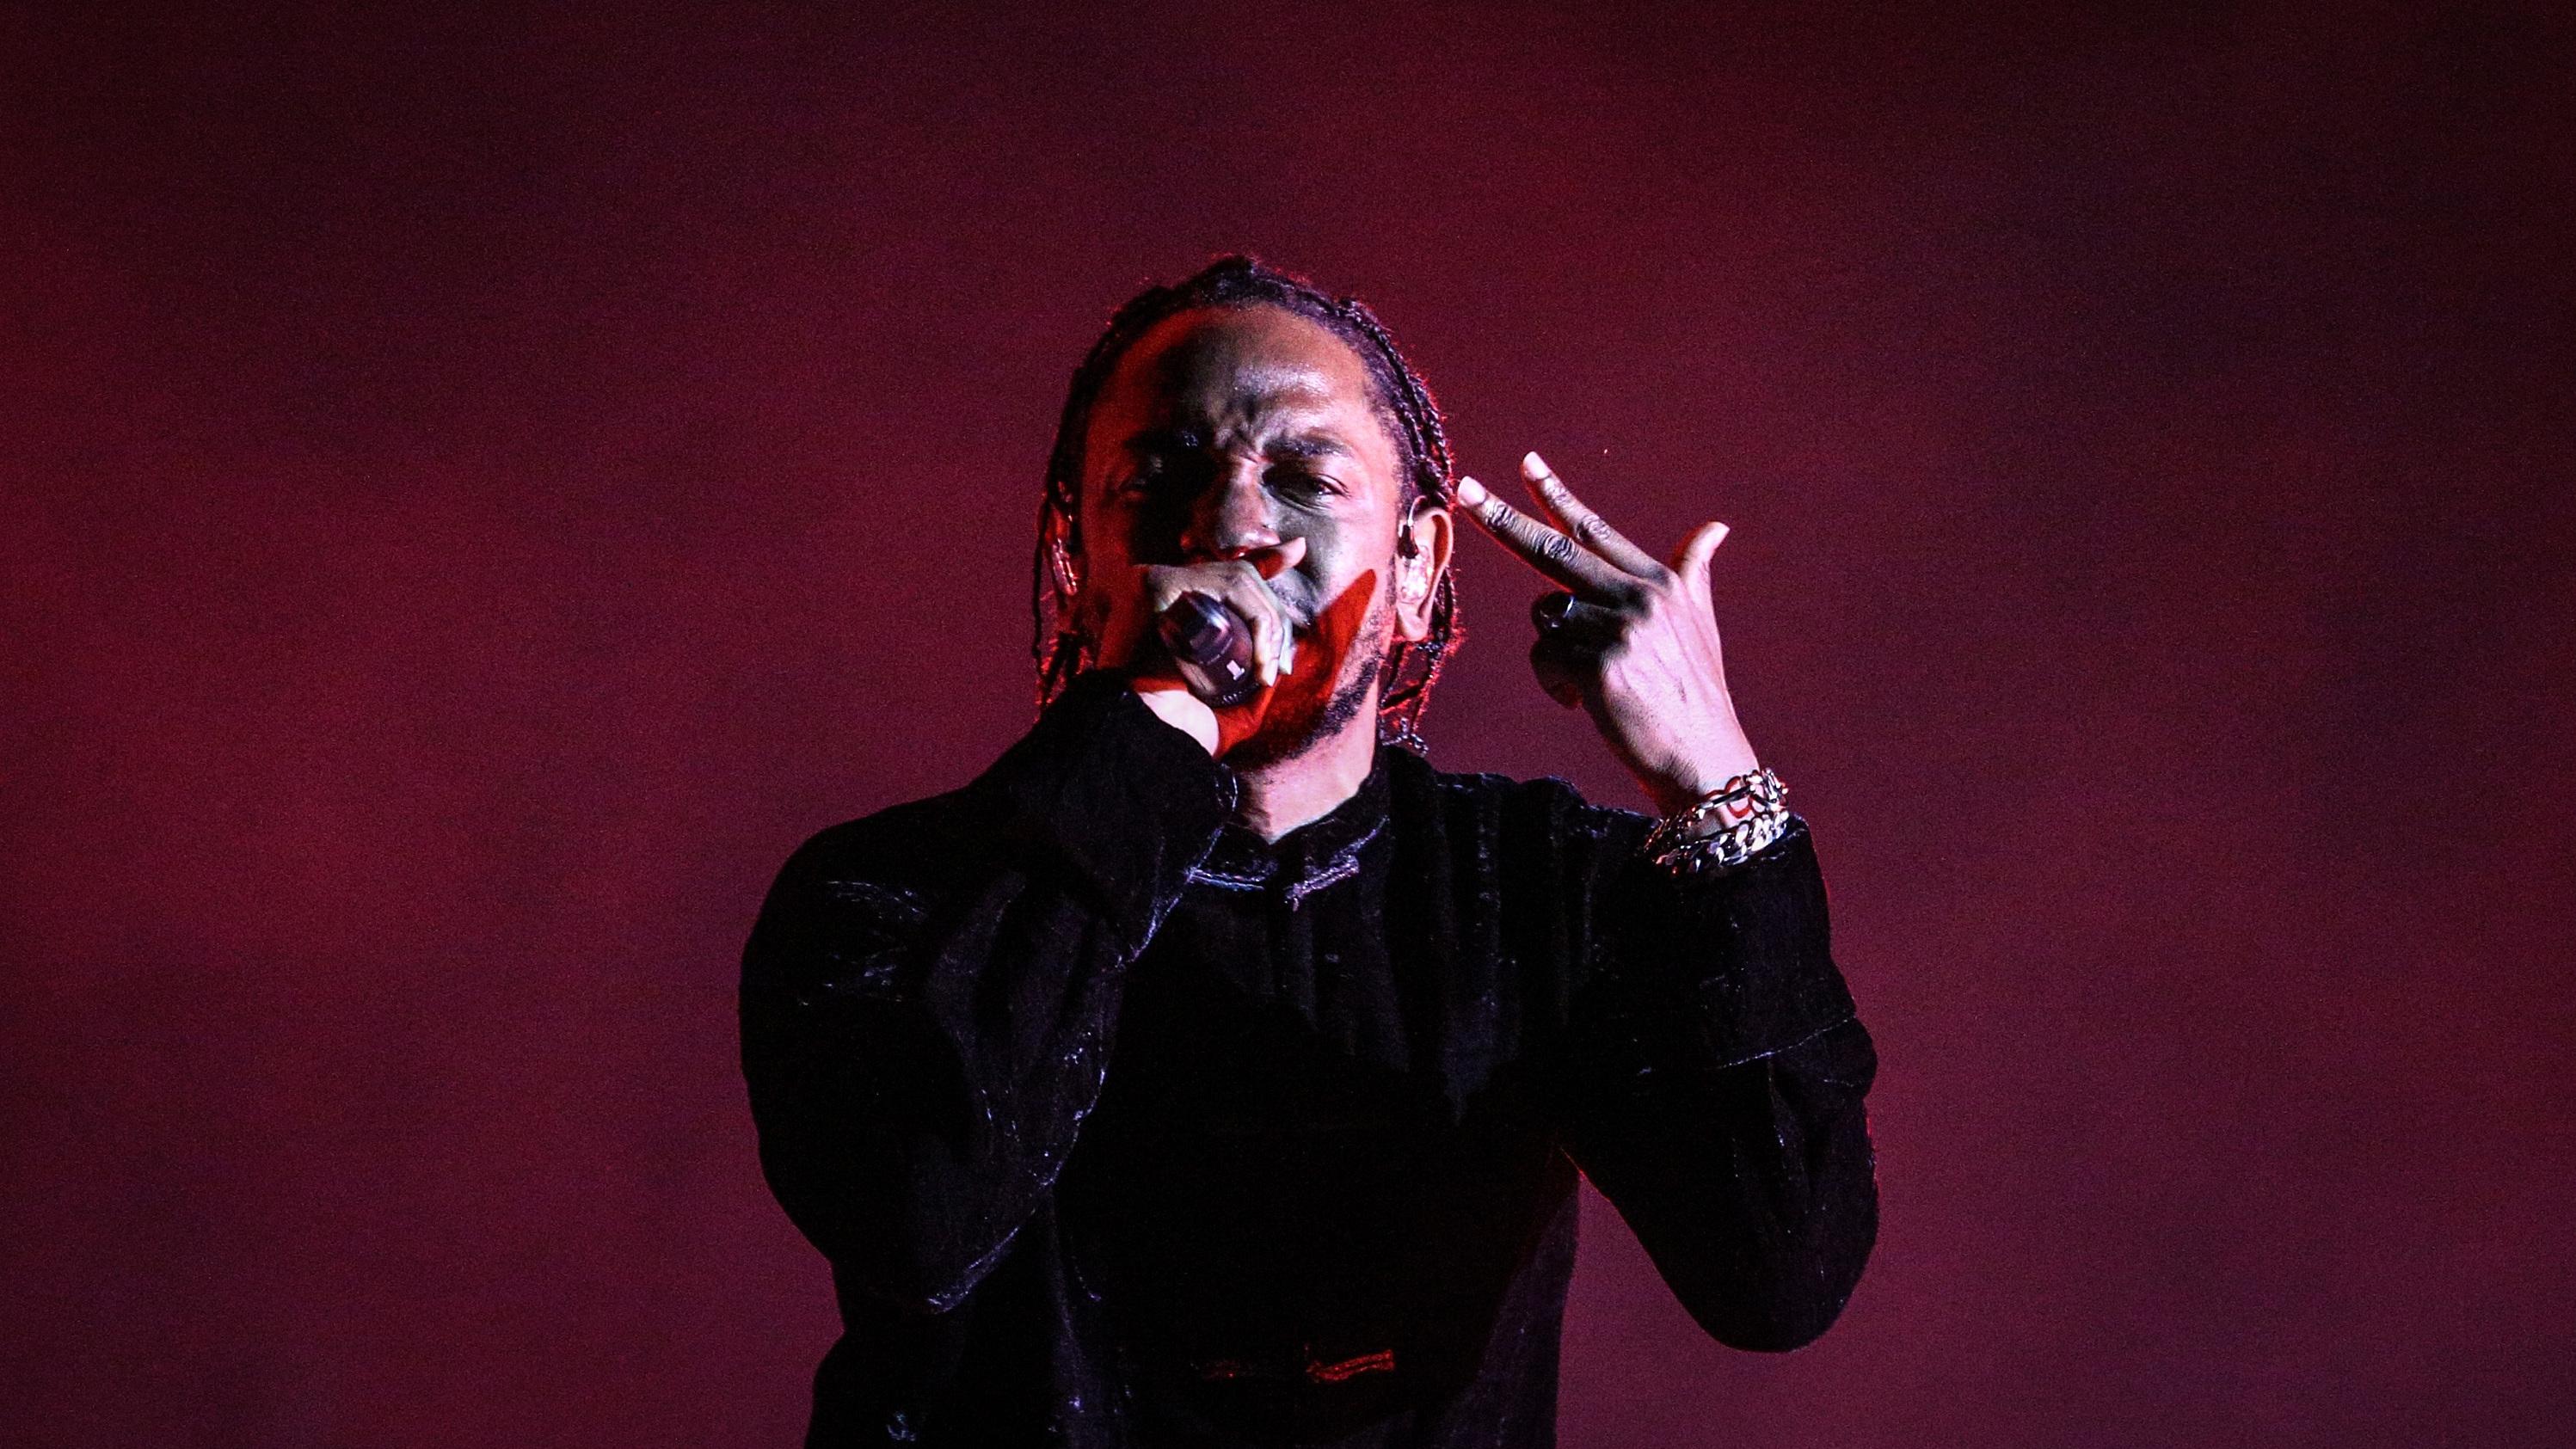 The Prophetic Struggle Of Kendrick Lamar's 'DAMN.'